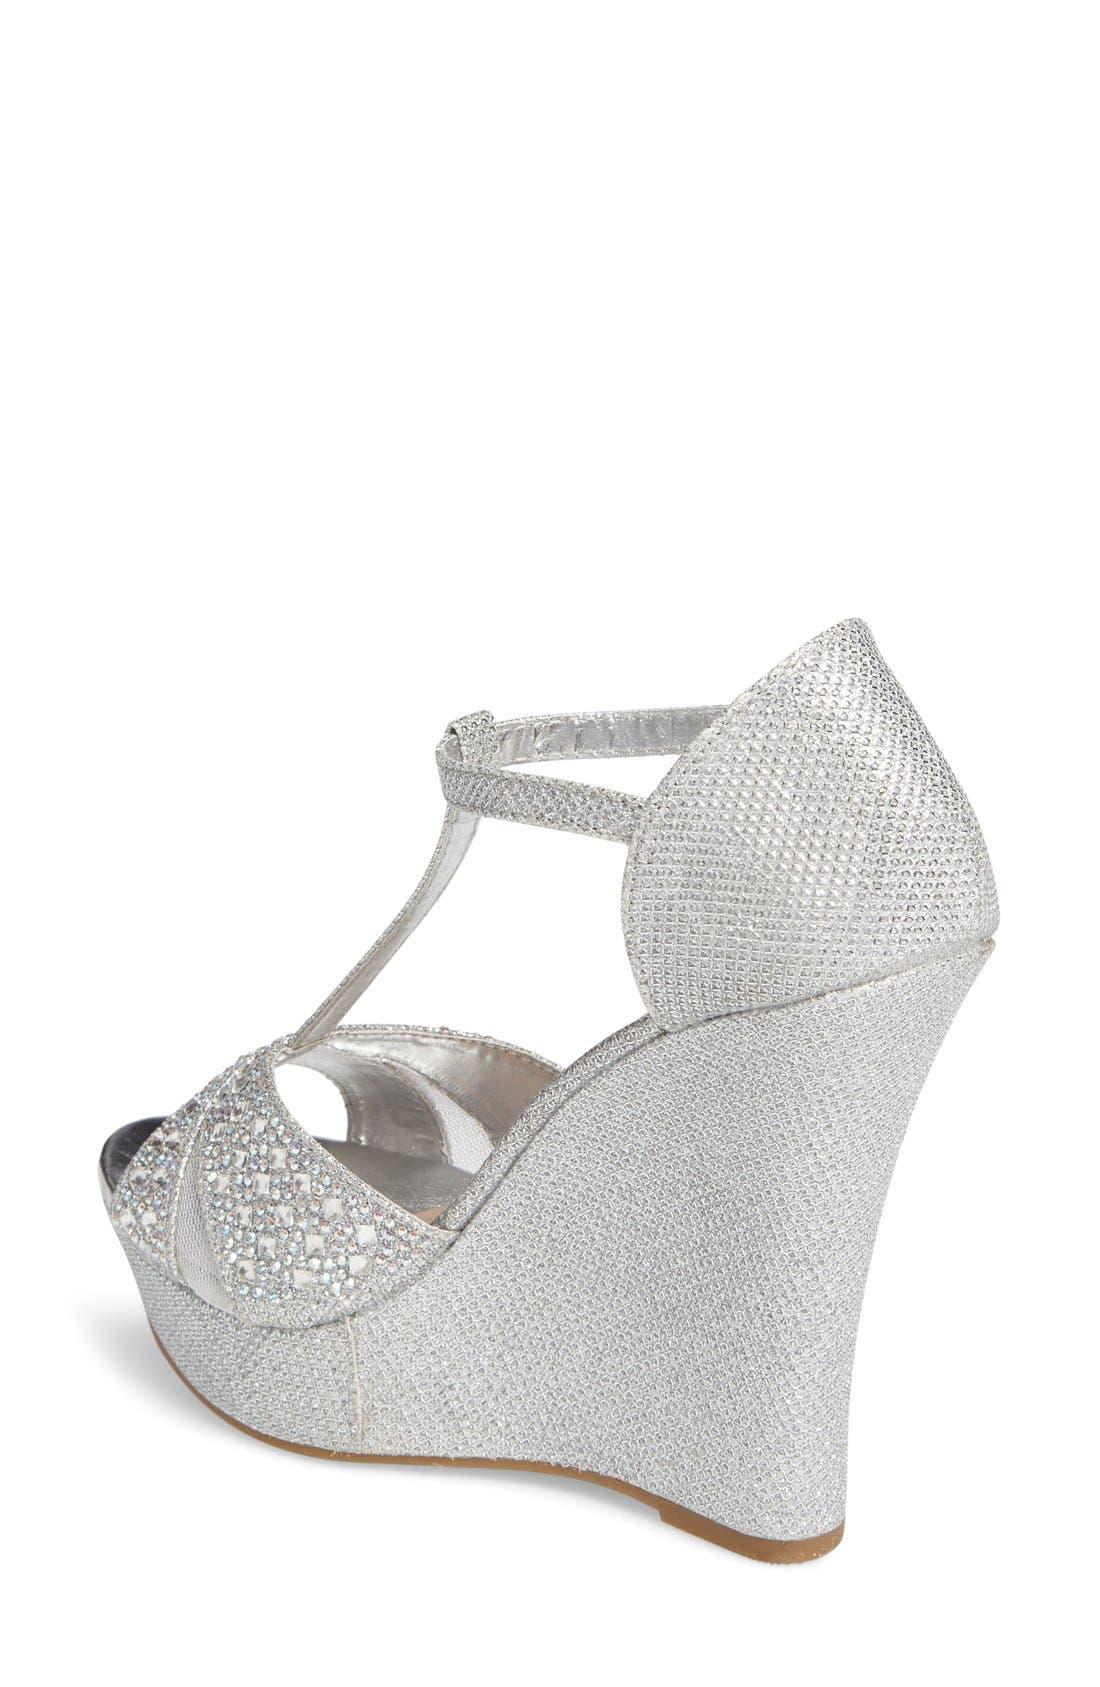 Alternate Image 2  - Lauren Lorraine Ness Crystal Embellished Wedge Sandal (Women)